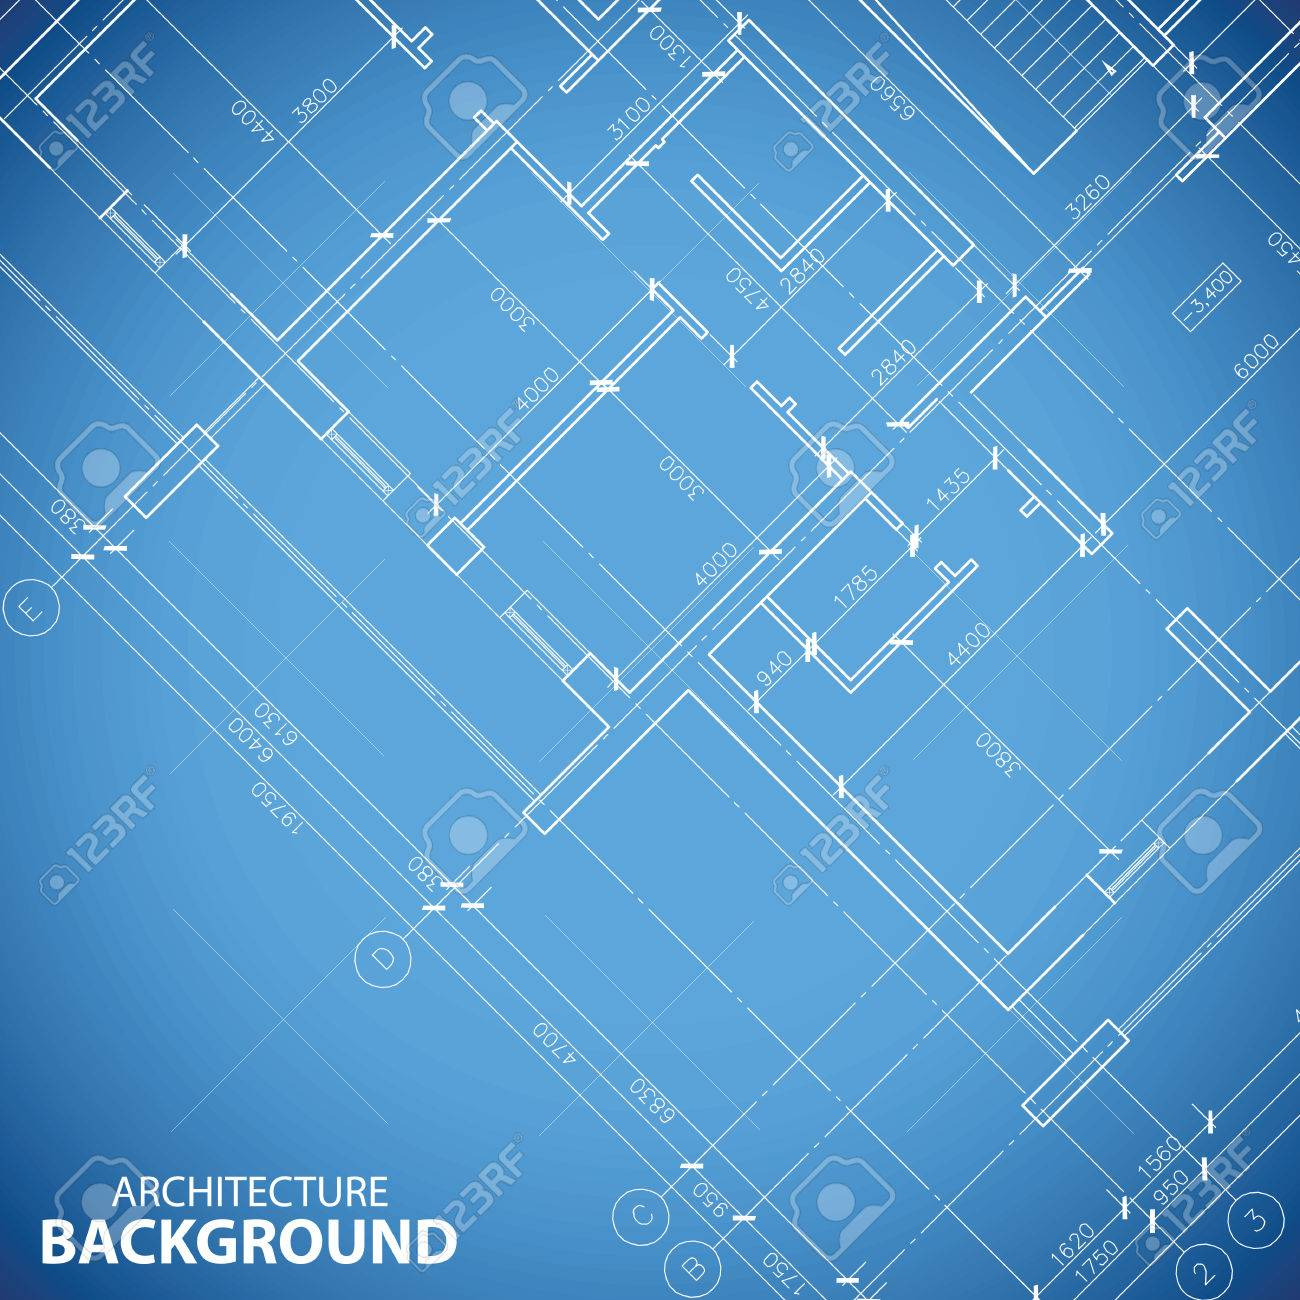 Blueprint Building Plan Background Royalty Free Cliparts Vectors